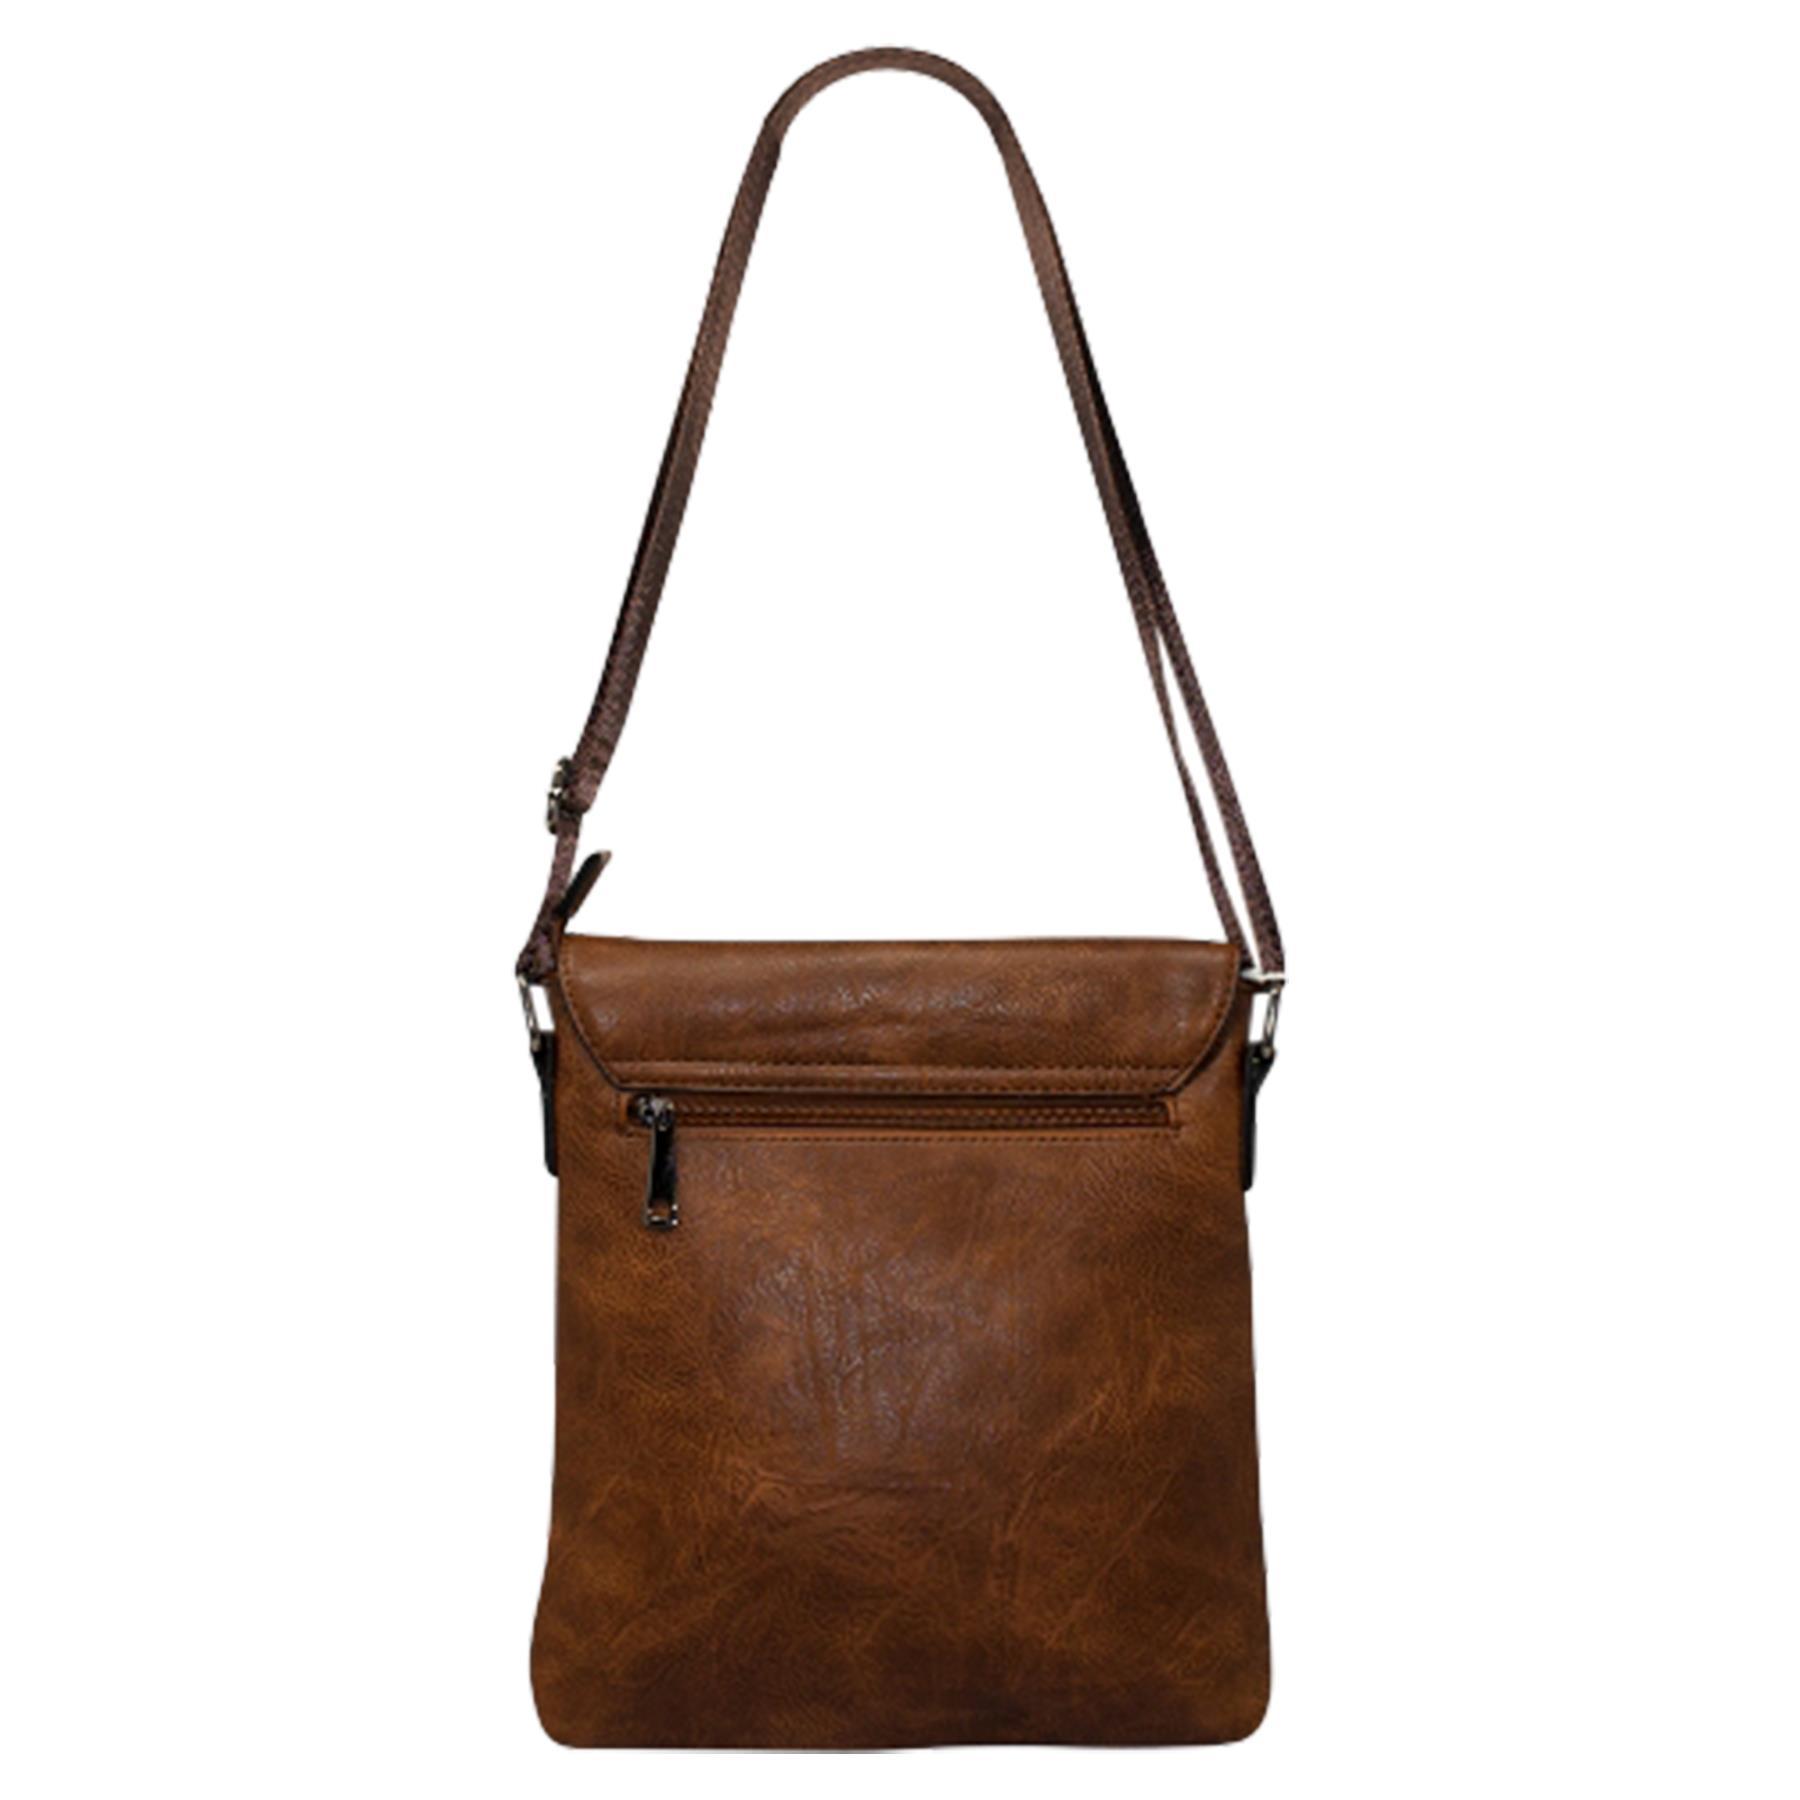 New-Plain-Faux-Leather-Men-s-Travel-Casual-Flap-Over-Messenger-Bag thumbnail 16